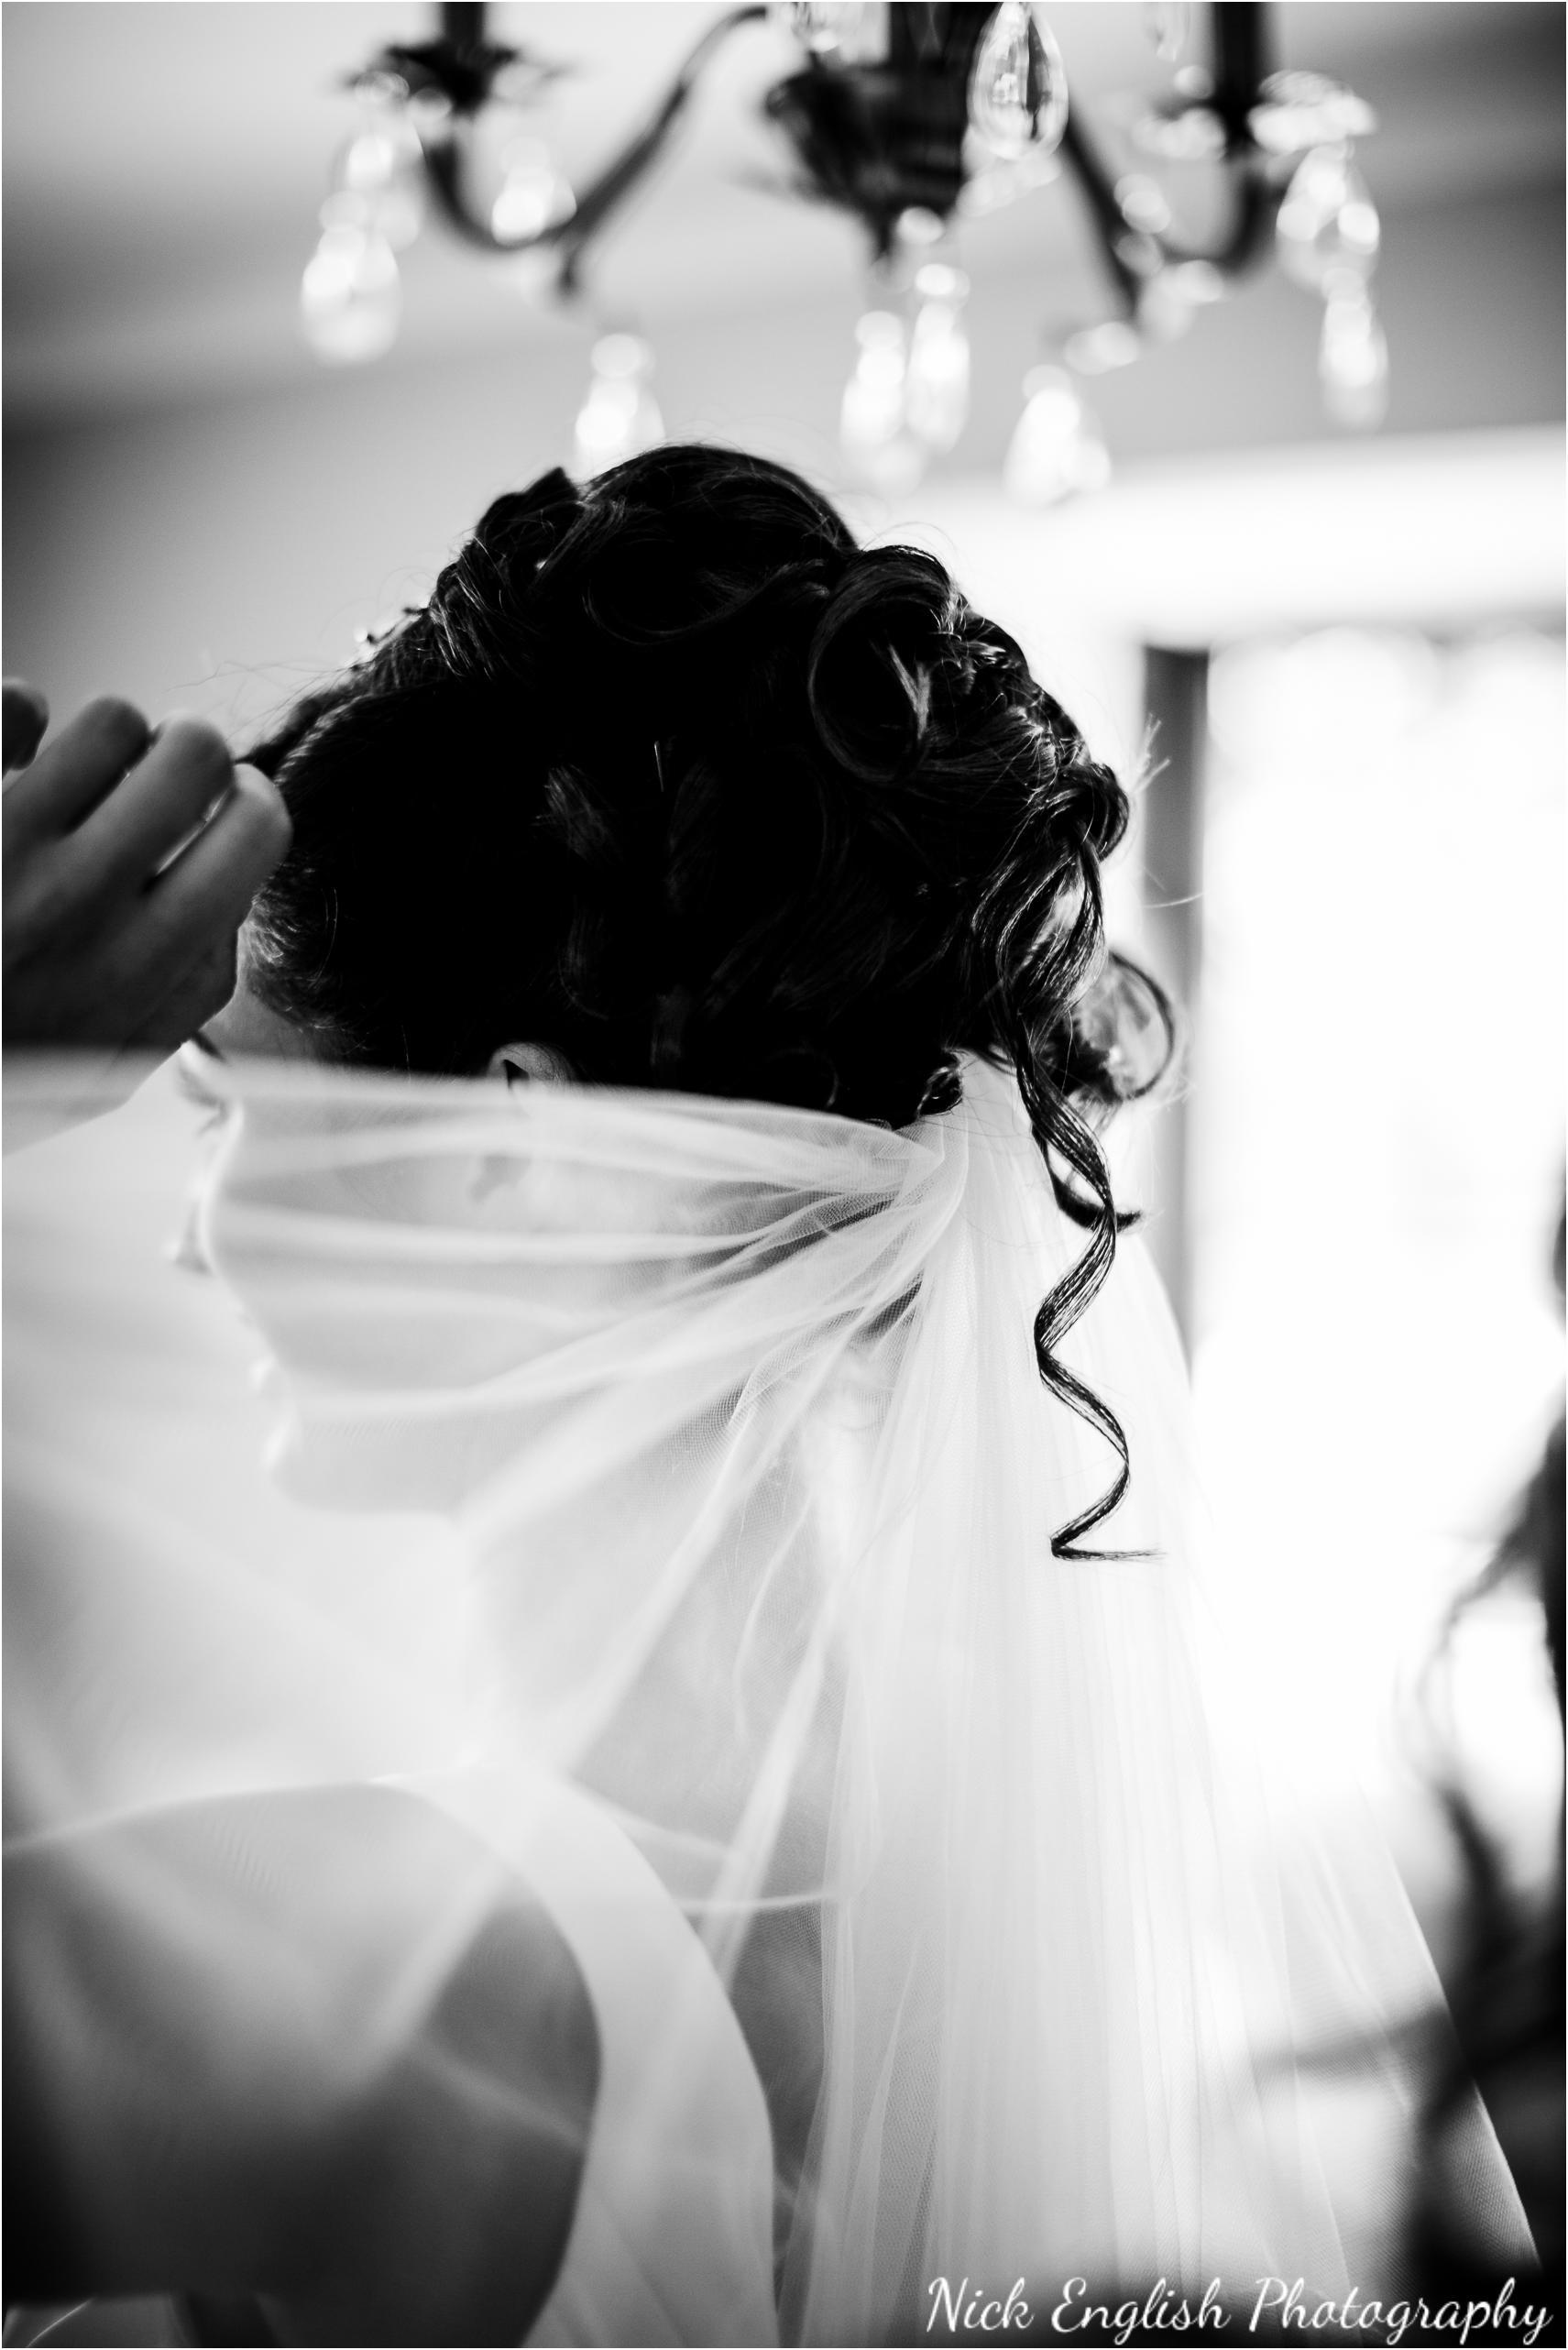 Emily David Wedding Photographs at Barton Grange Preston by Nick English Photography 31jpg.jpeg